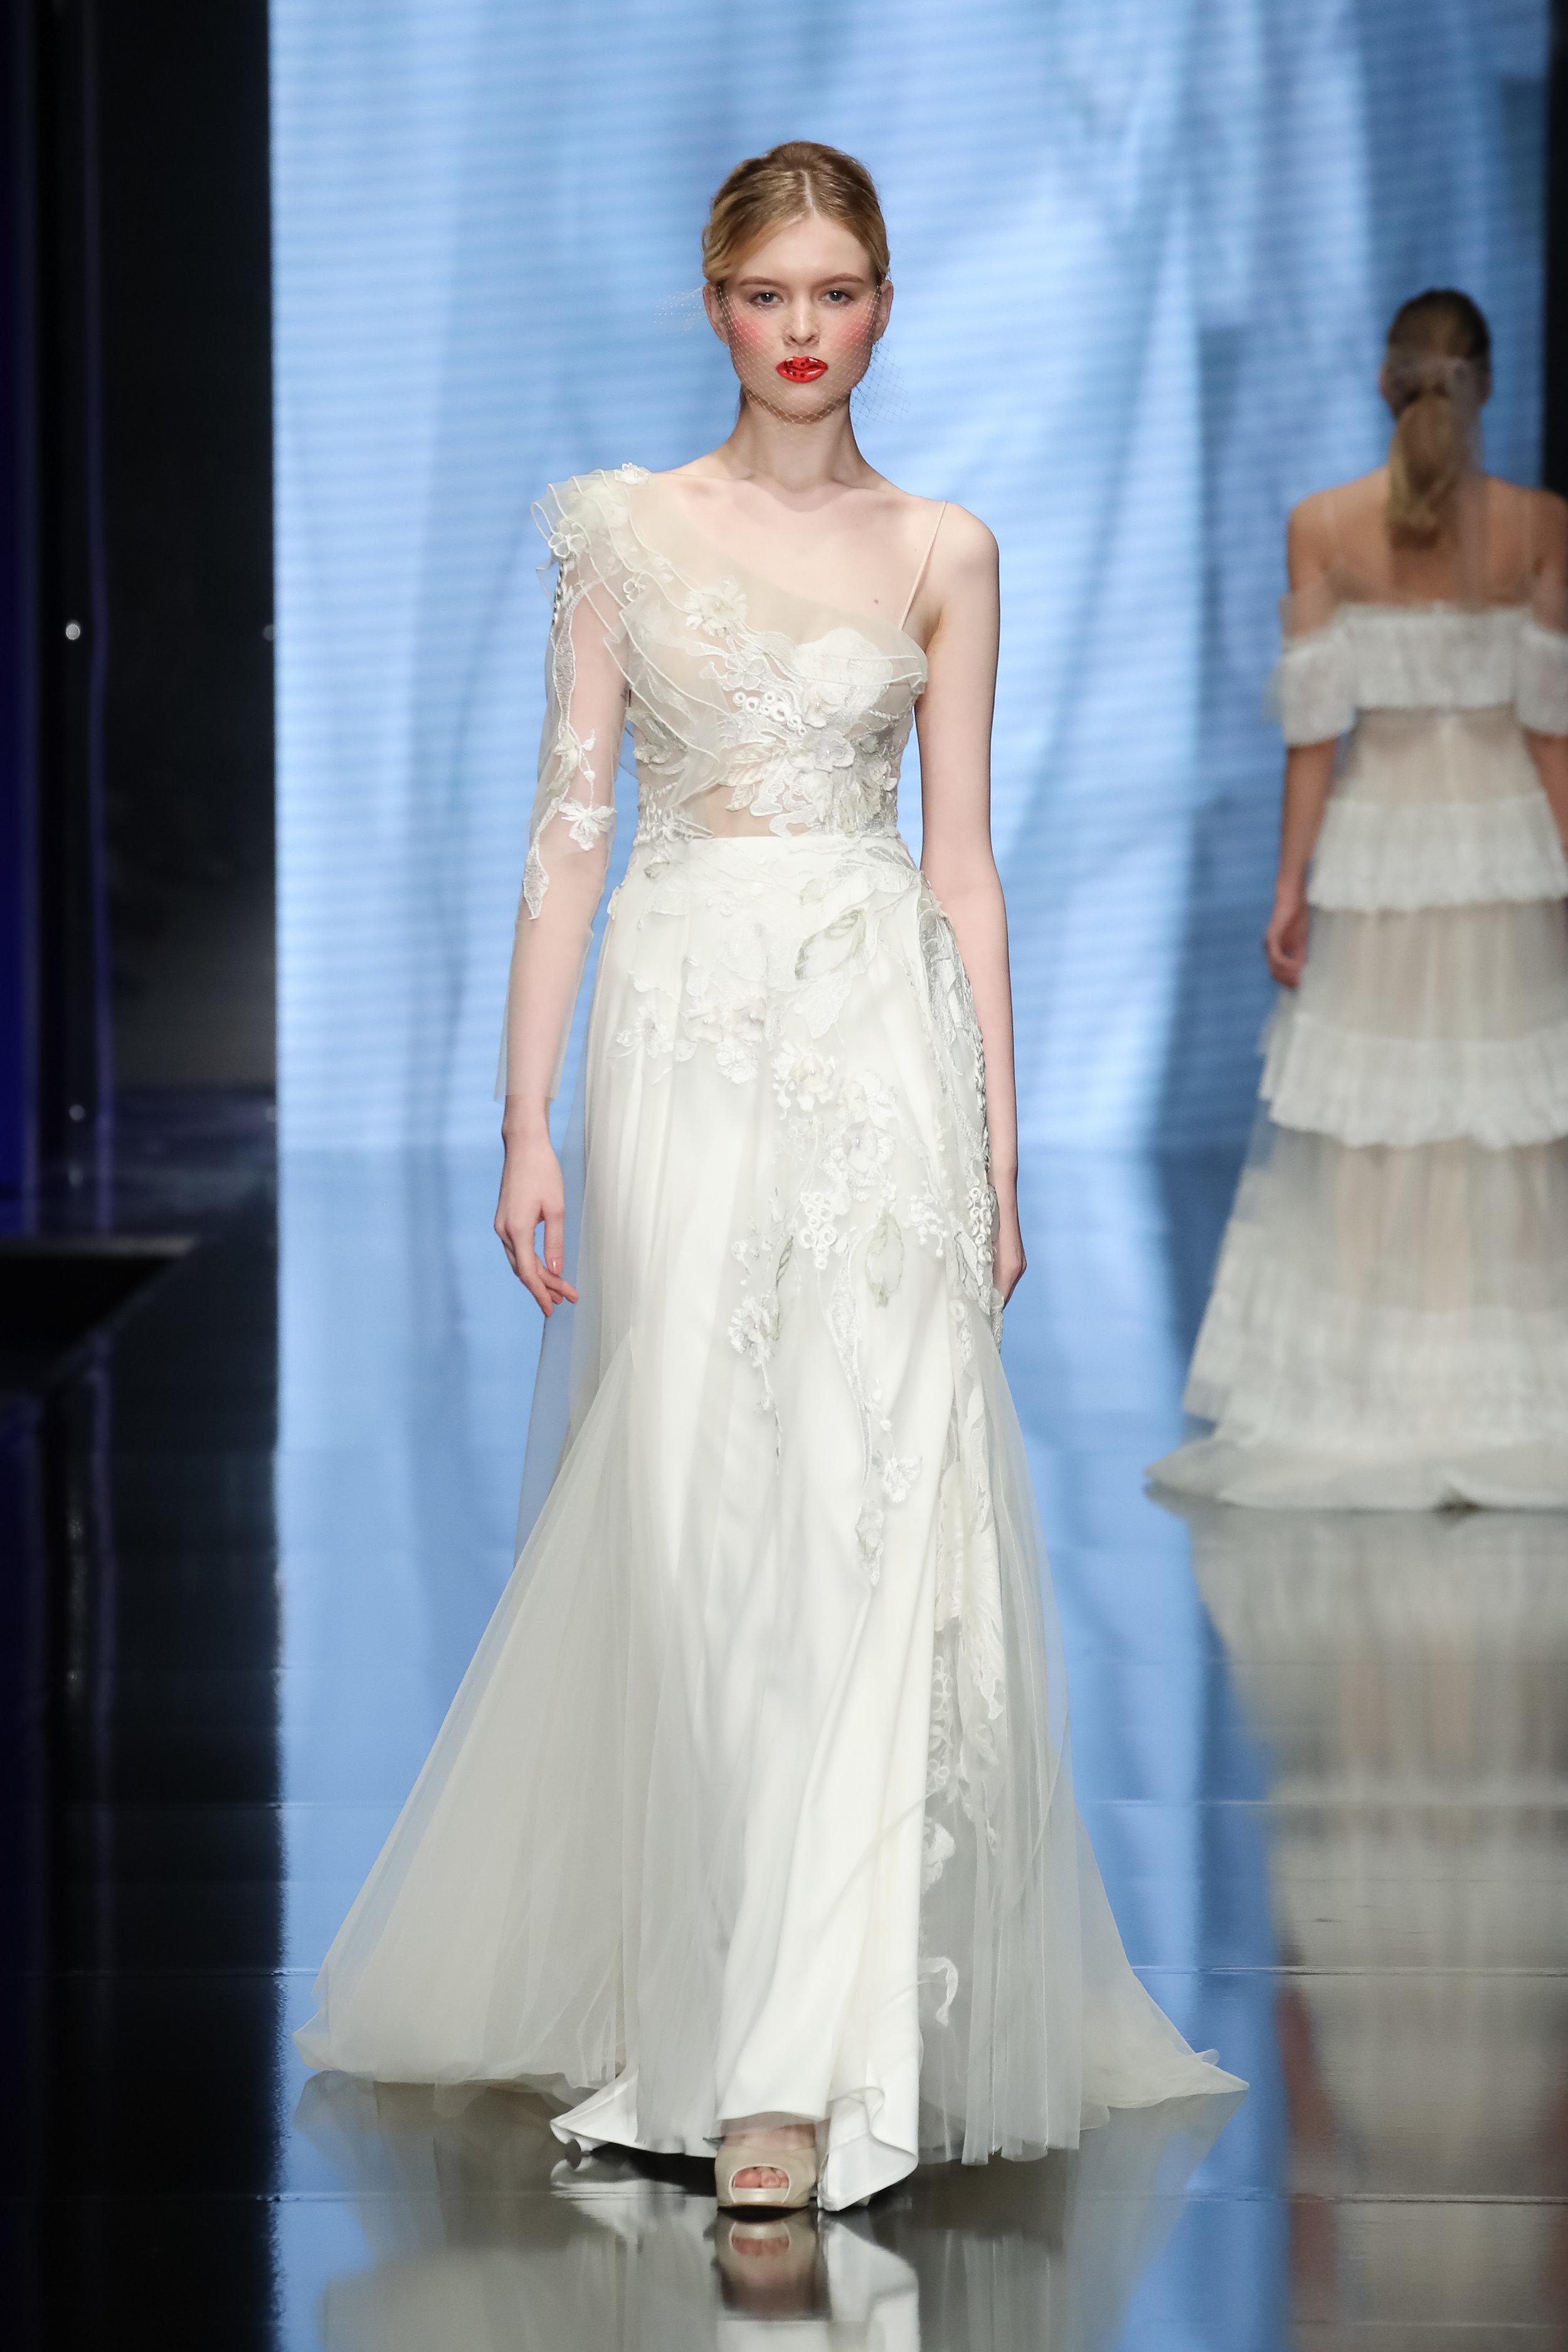 Designer: Papilio - Pasarela   Sì Sposaitalia Collezioni    Milano Bridal Week